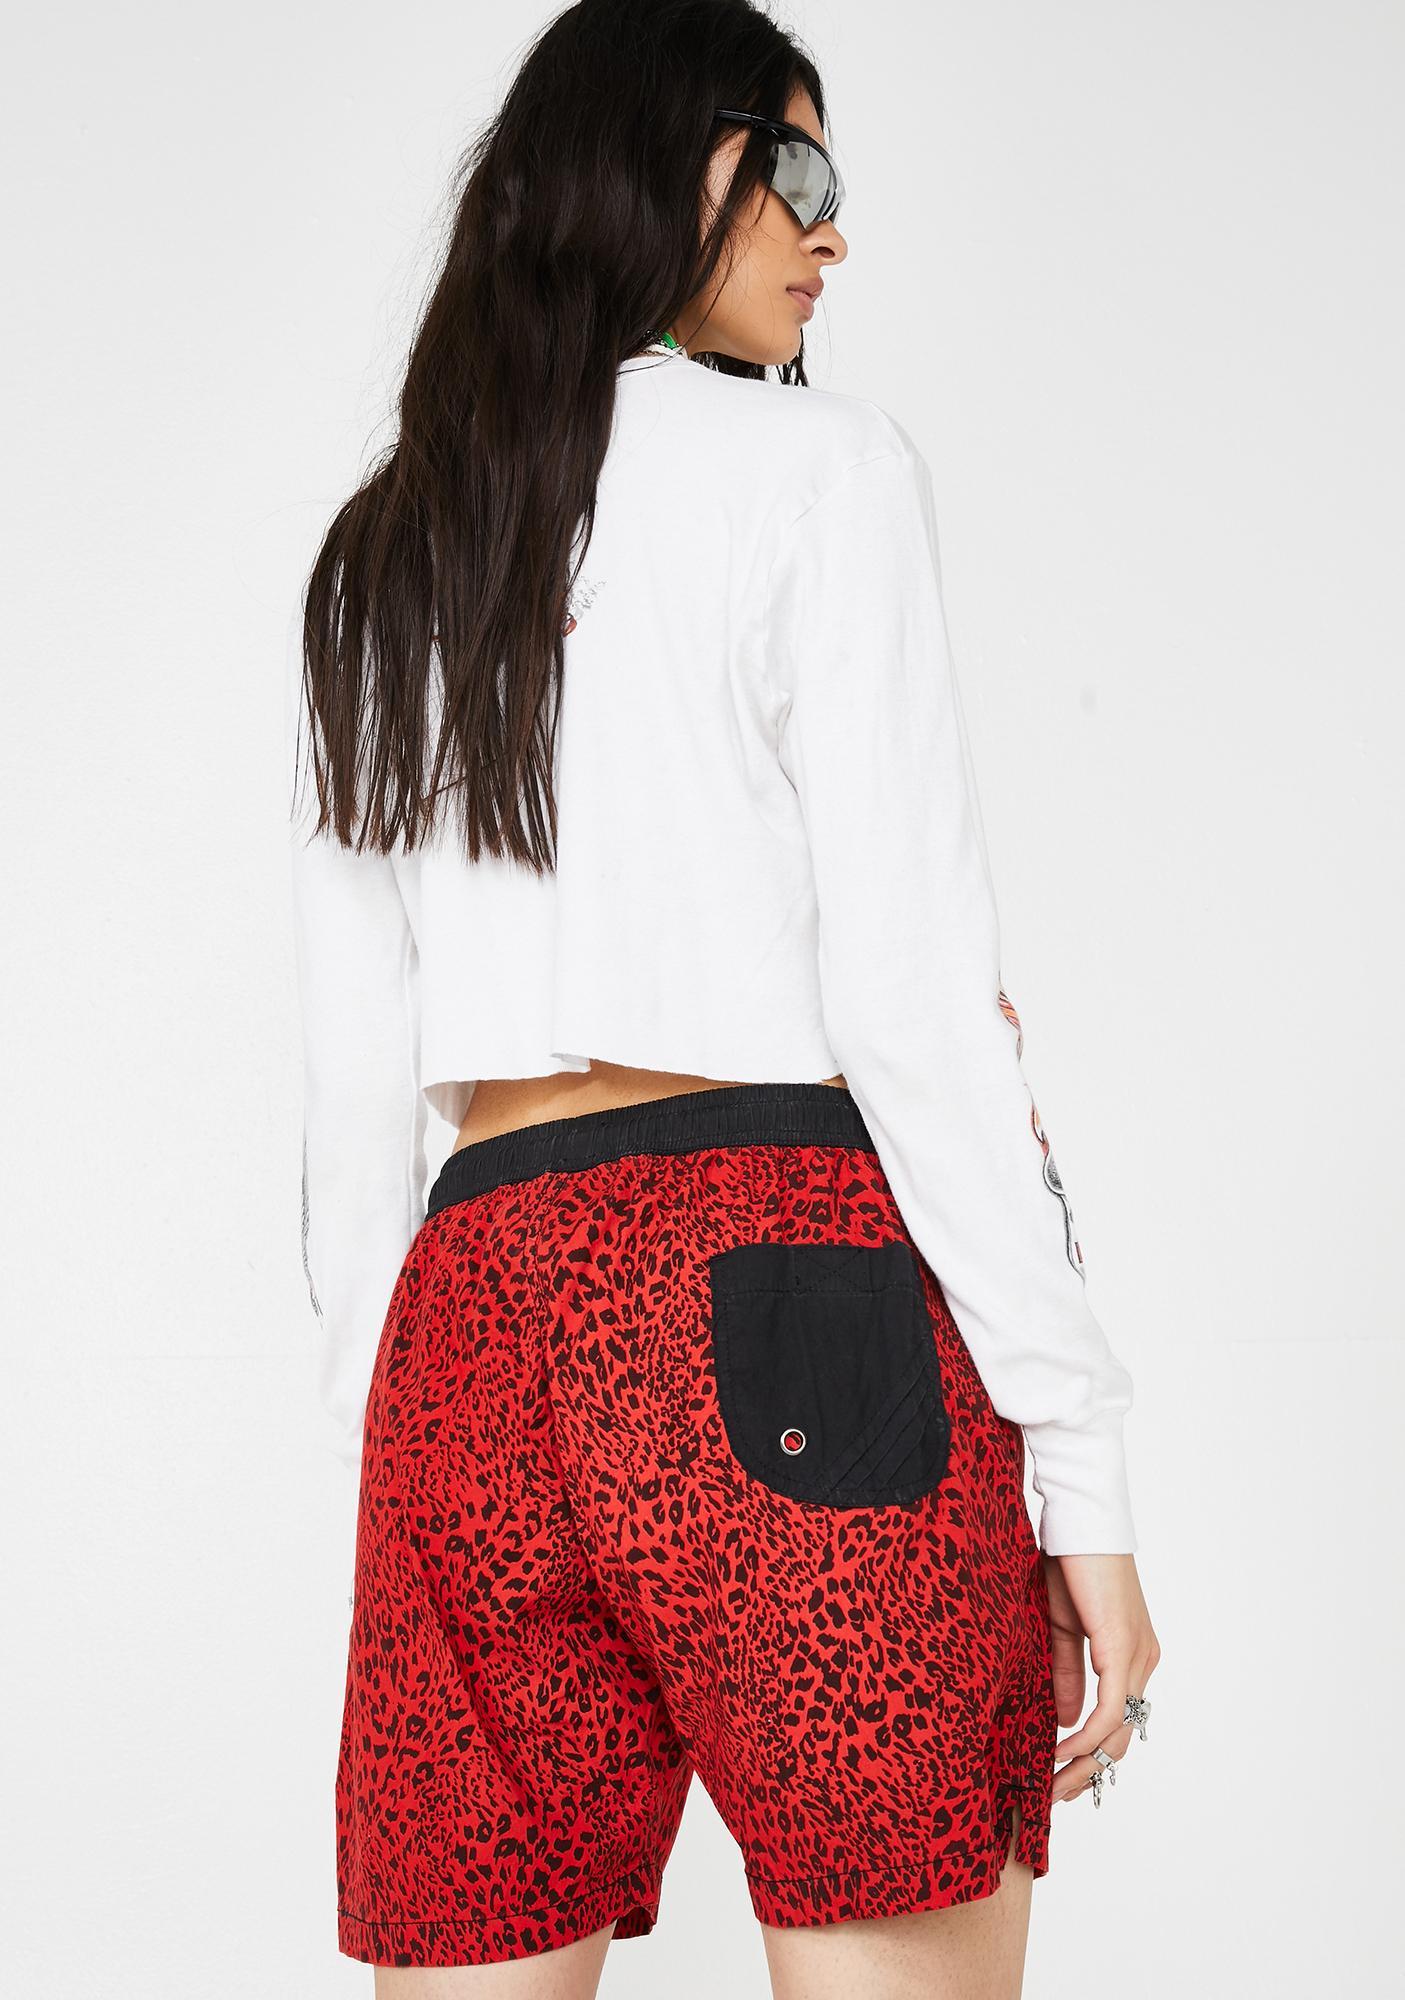 The People VS Easy Boardie Leopard Shorts